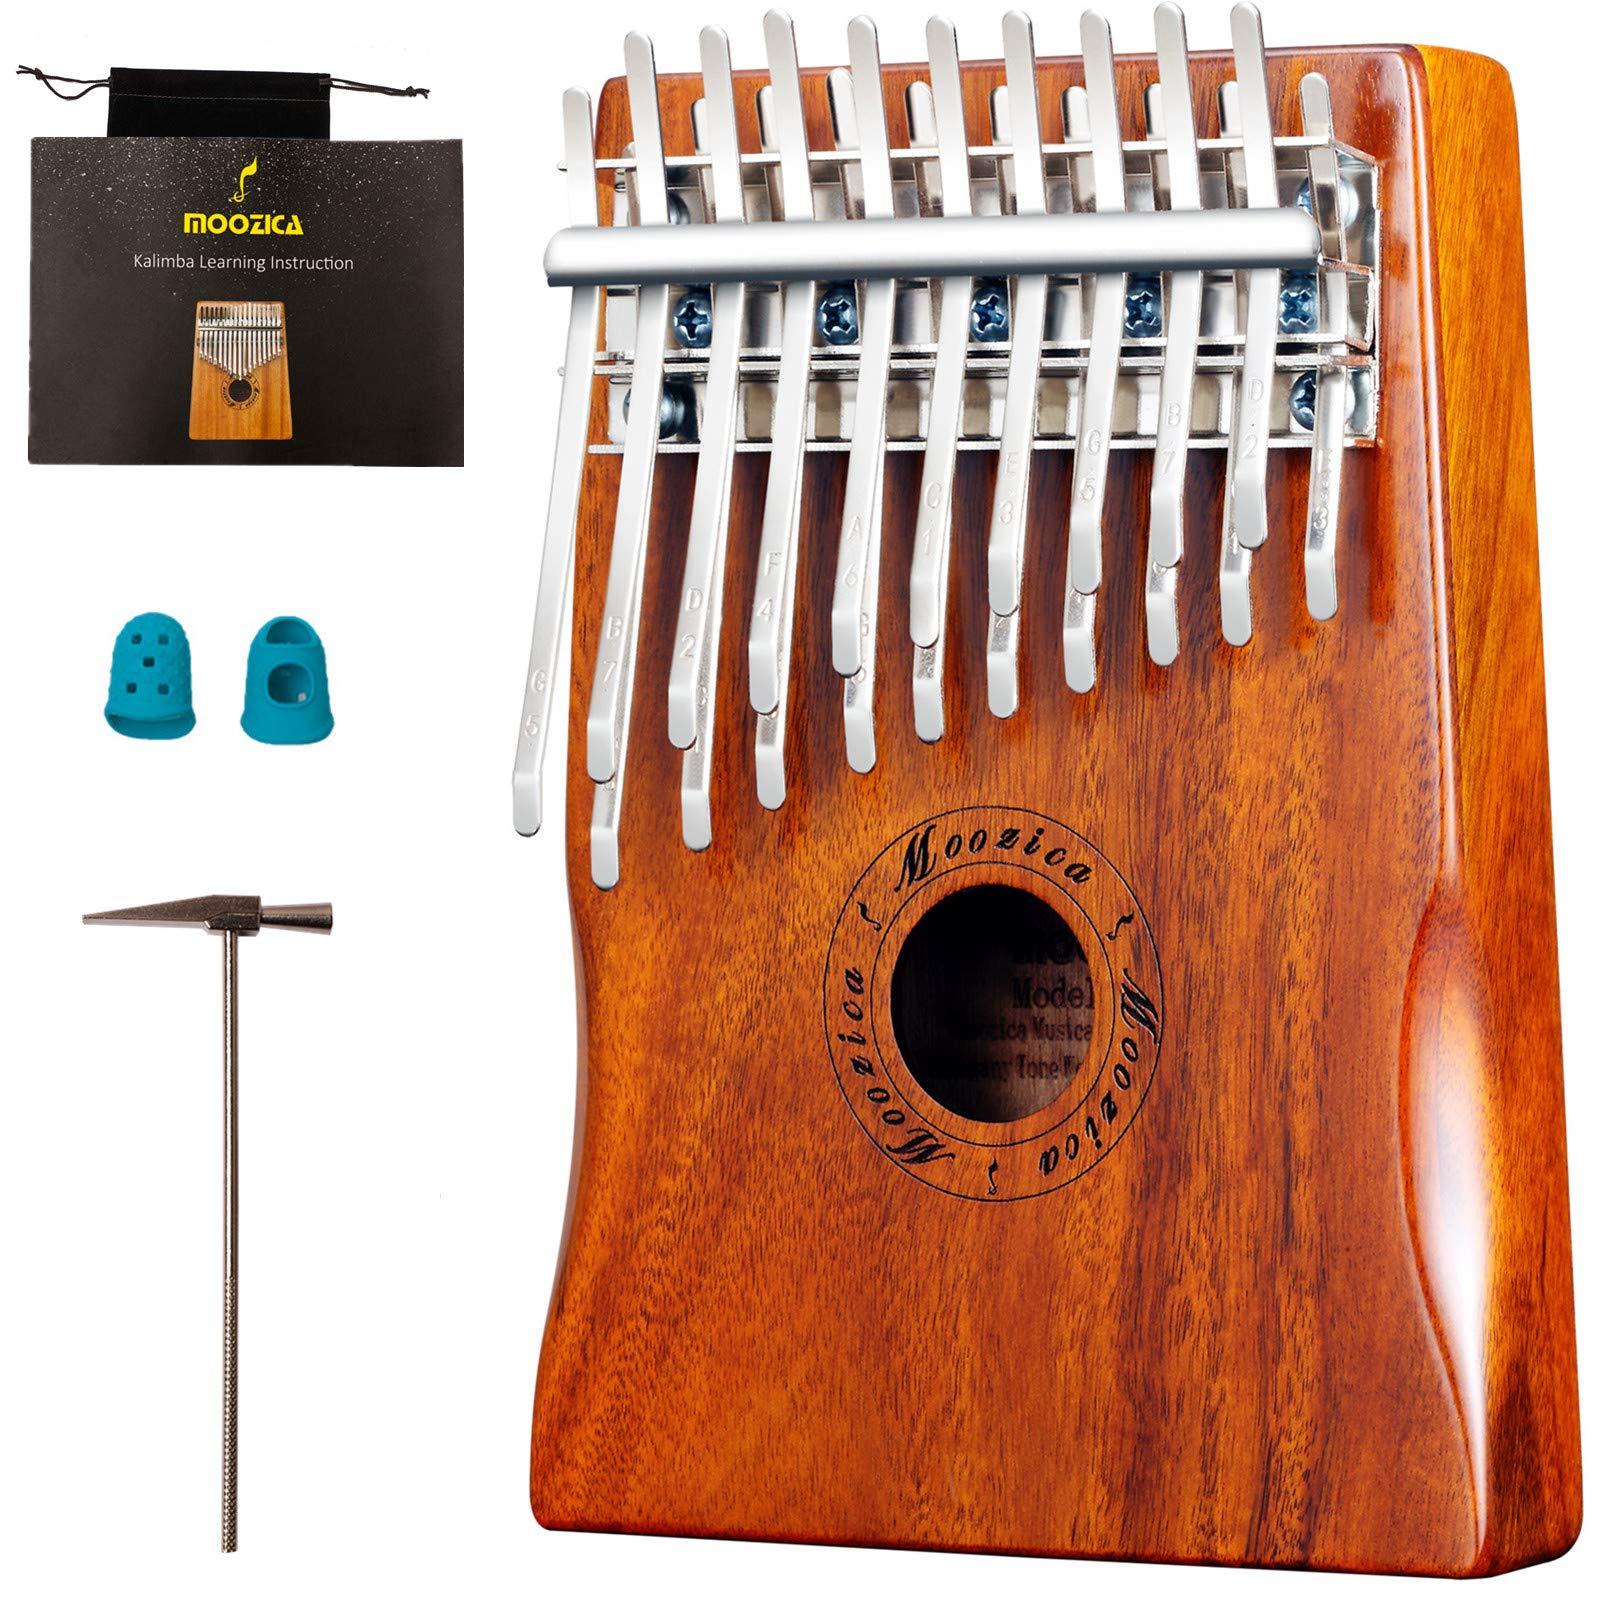 Moozica Solid Koa Wood Kalimba 20 Keys, Double-layer 20 Tines Thumb Piano Marimba With Learning Instruction Book(K20K) by Moozica